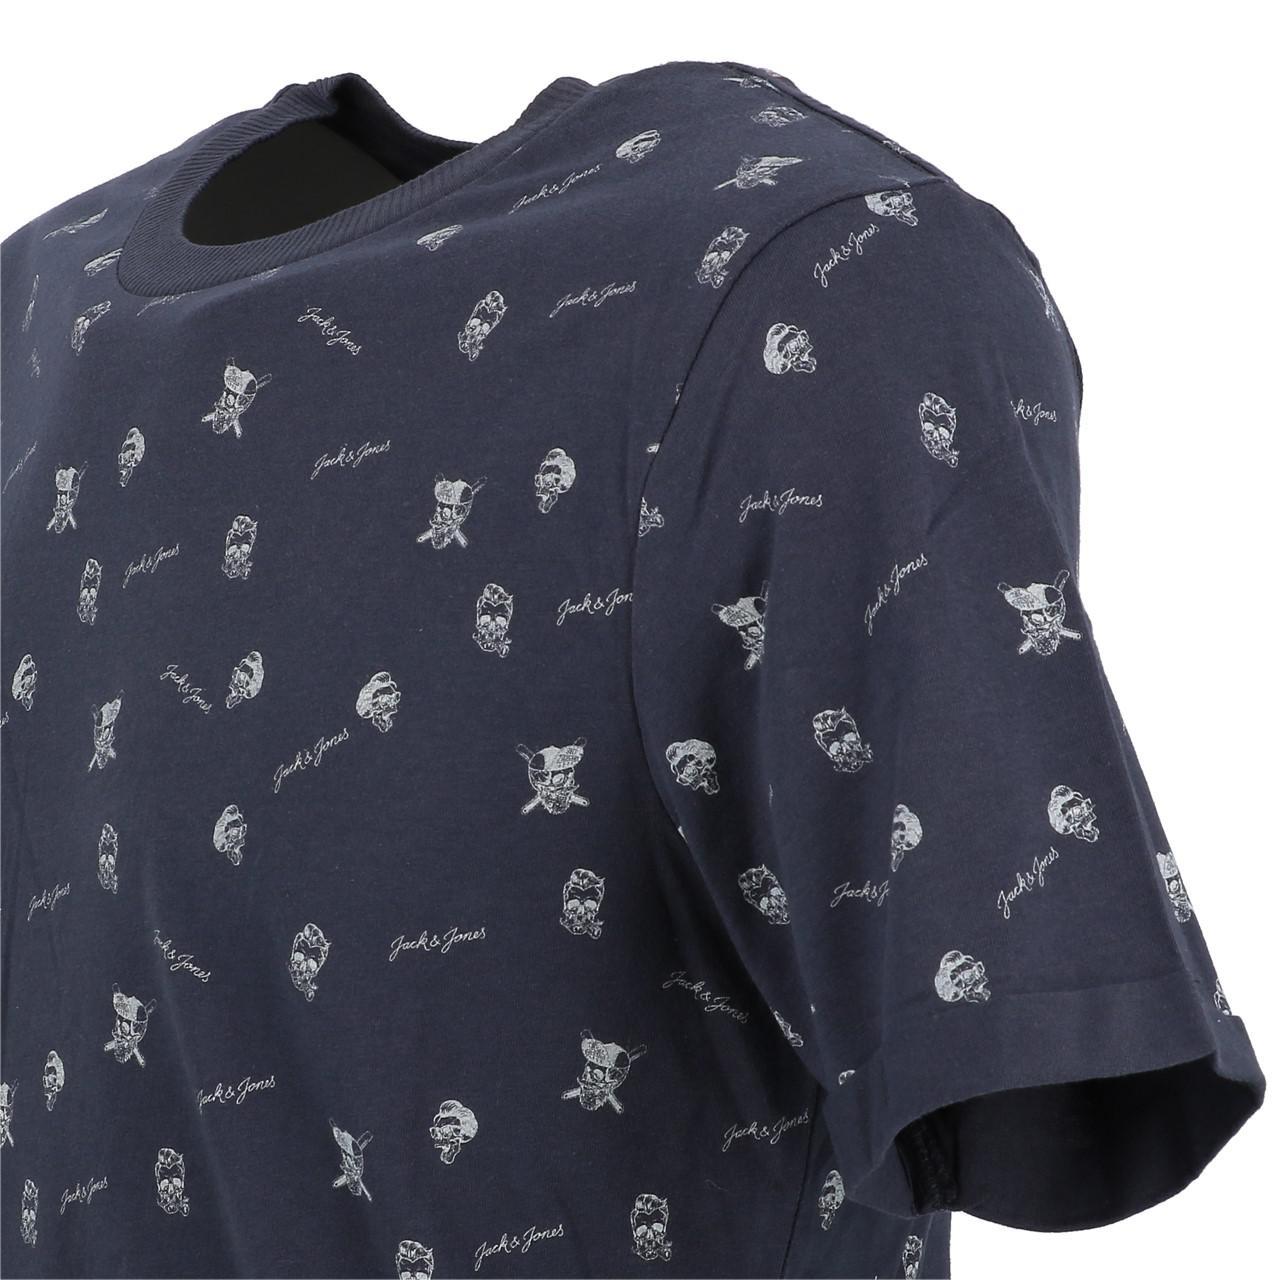 Short-Sleeve-T-Shirt-Jack-and-Jones-Cam-Total-Eclipse-Mc-Tee-Blue-28409-N thumbnail 3